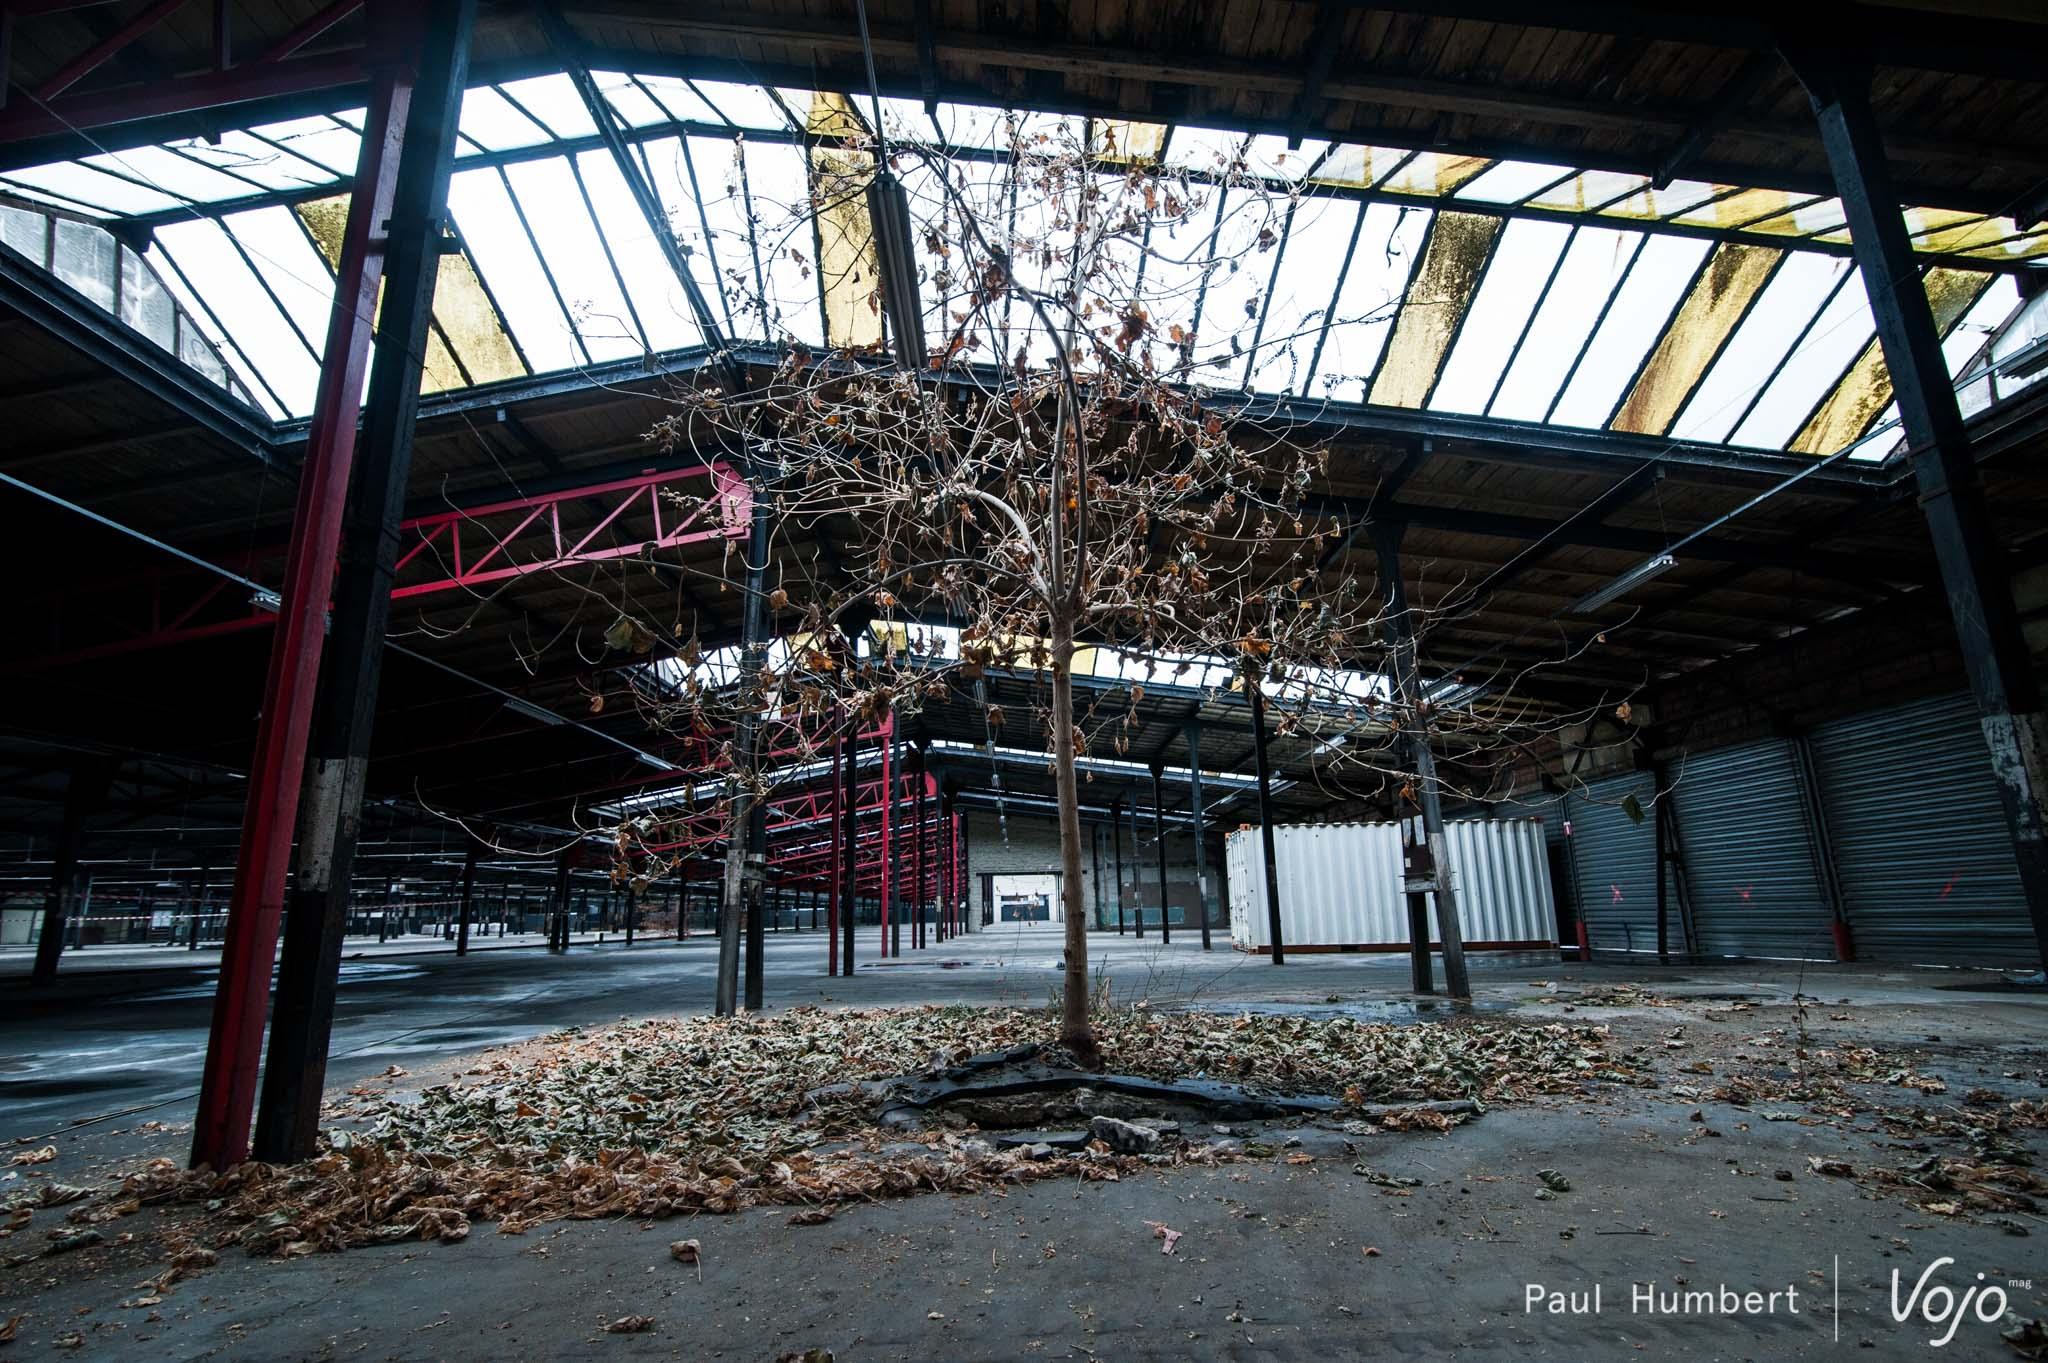 stride-bike-park-indoor-strasbourg-2016-vojo-paul-humbert-12